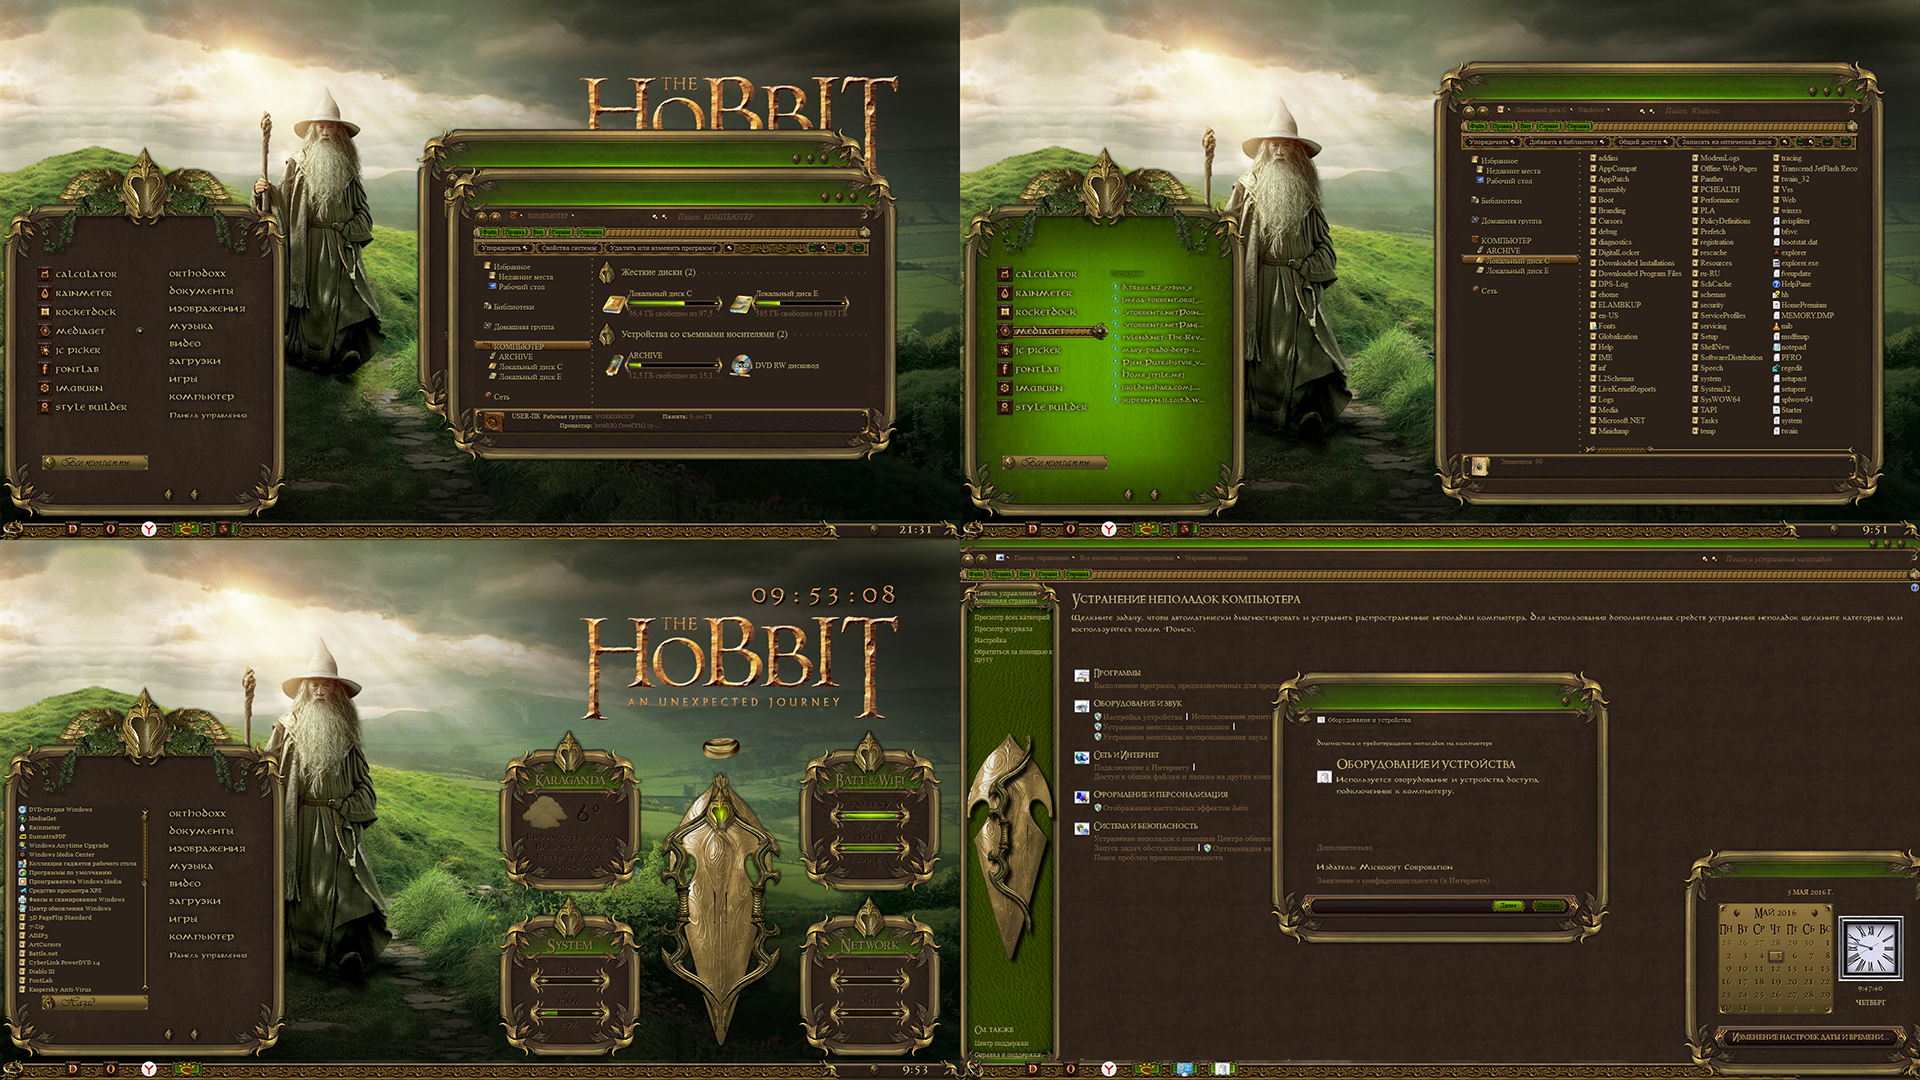 Hobbit gmail theme - Hobbit Theme For Windows 7 By Orthodoxx67